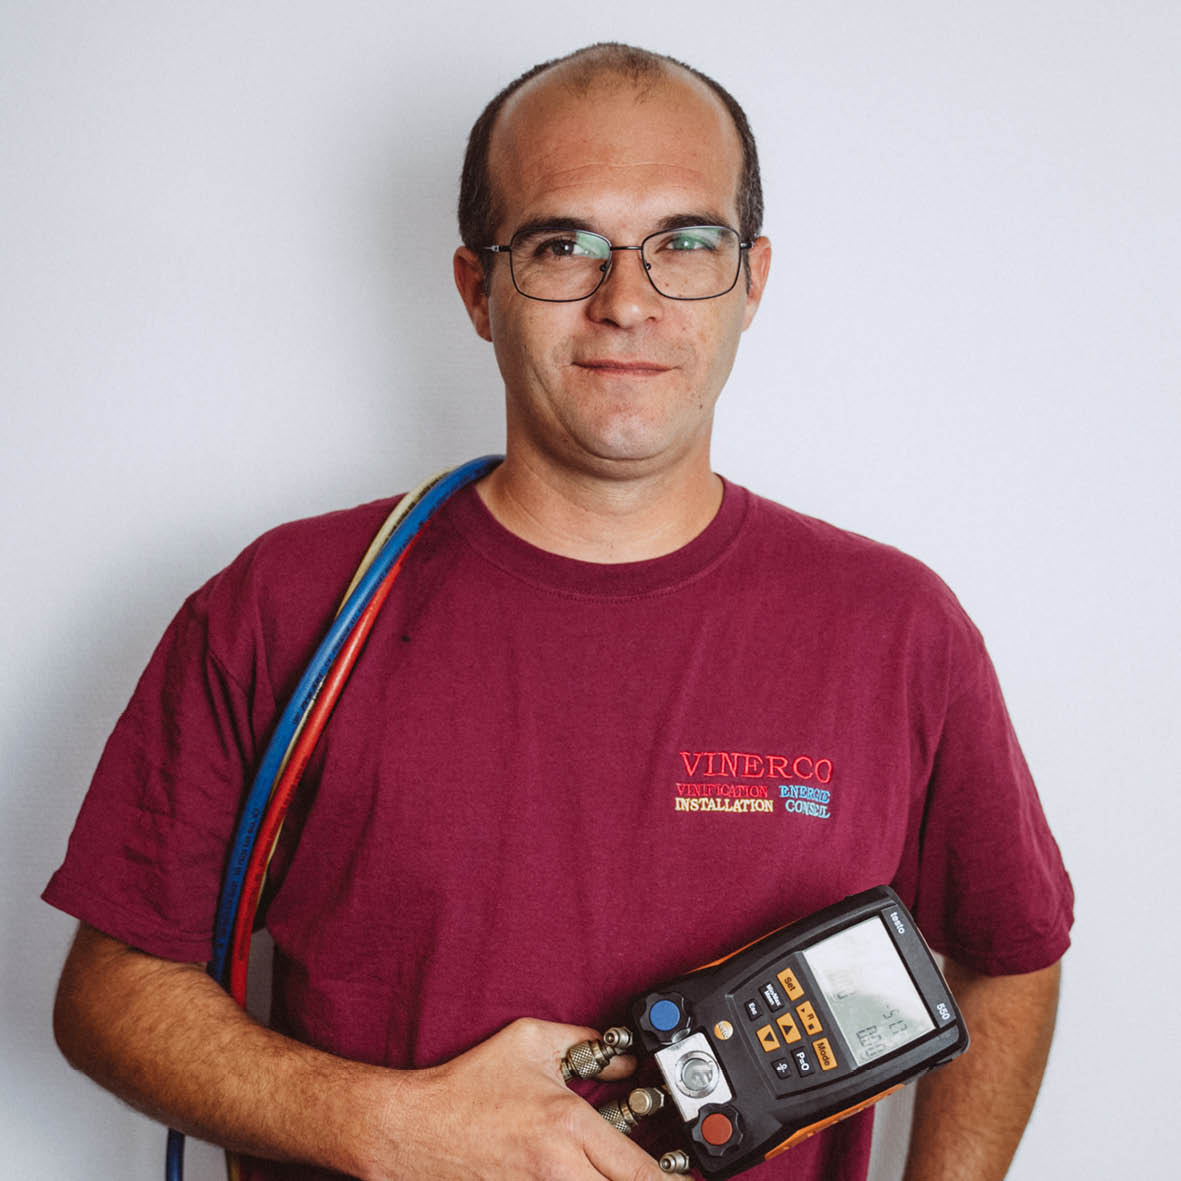 Nicolas, Technicien de Maintenance Vinerco 71